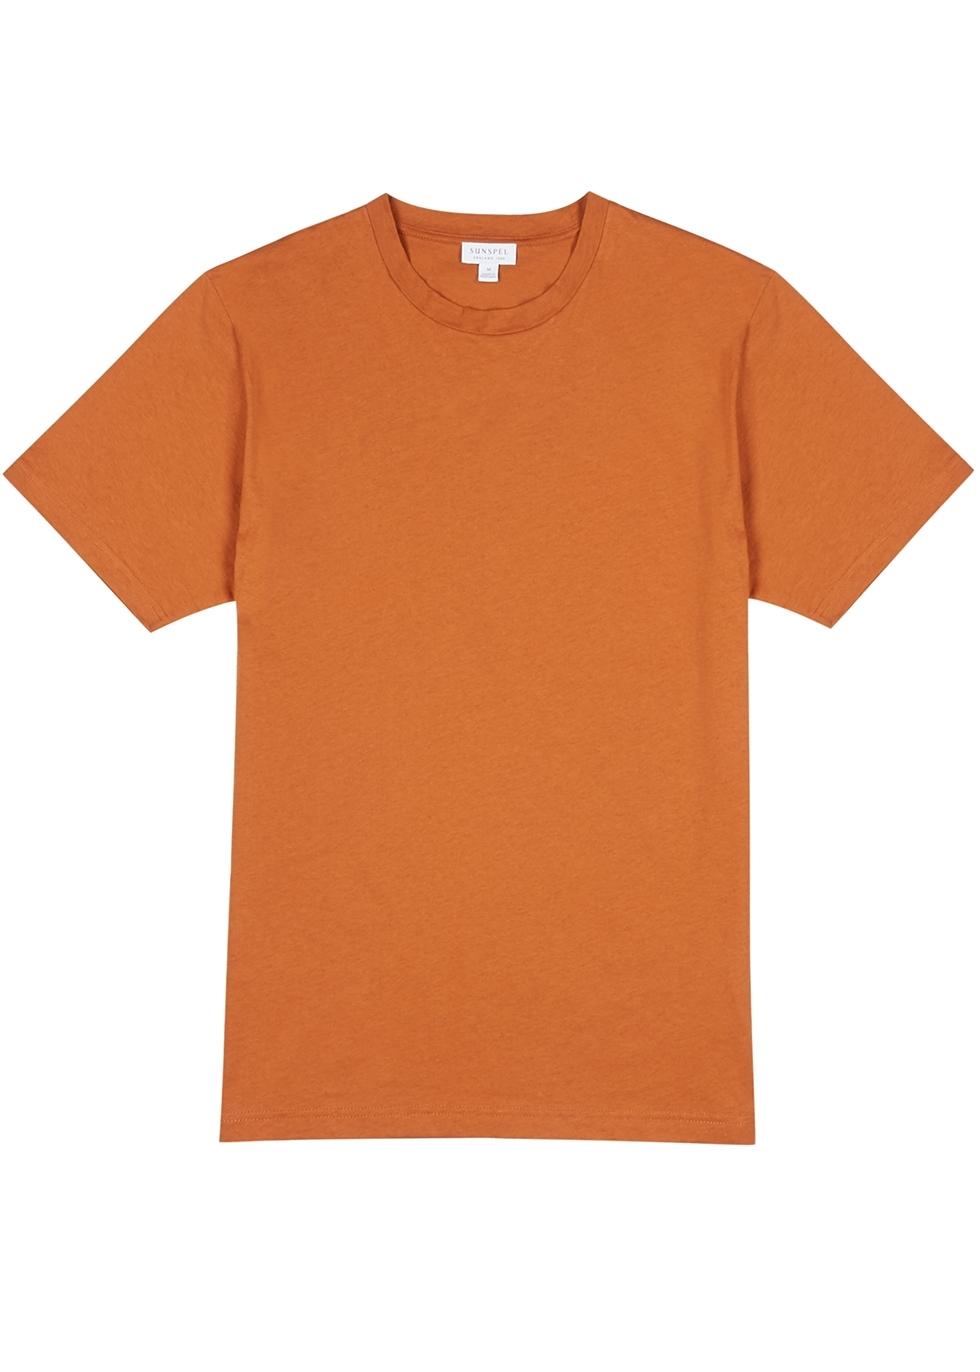 649c950c4 T-shirts & Vests - Harvey Nichols